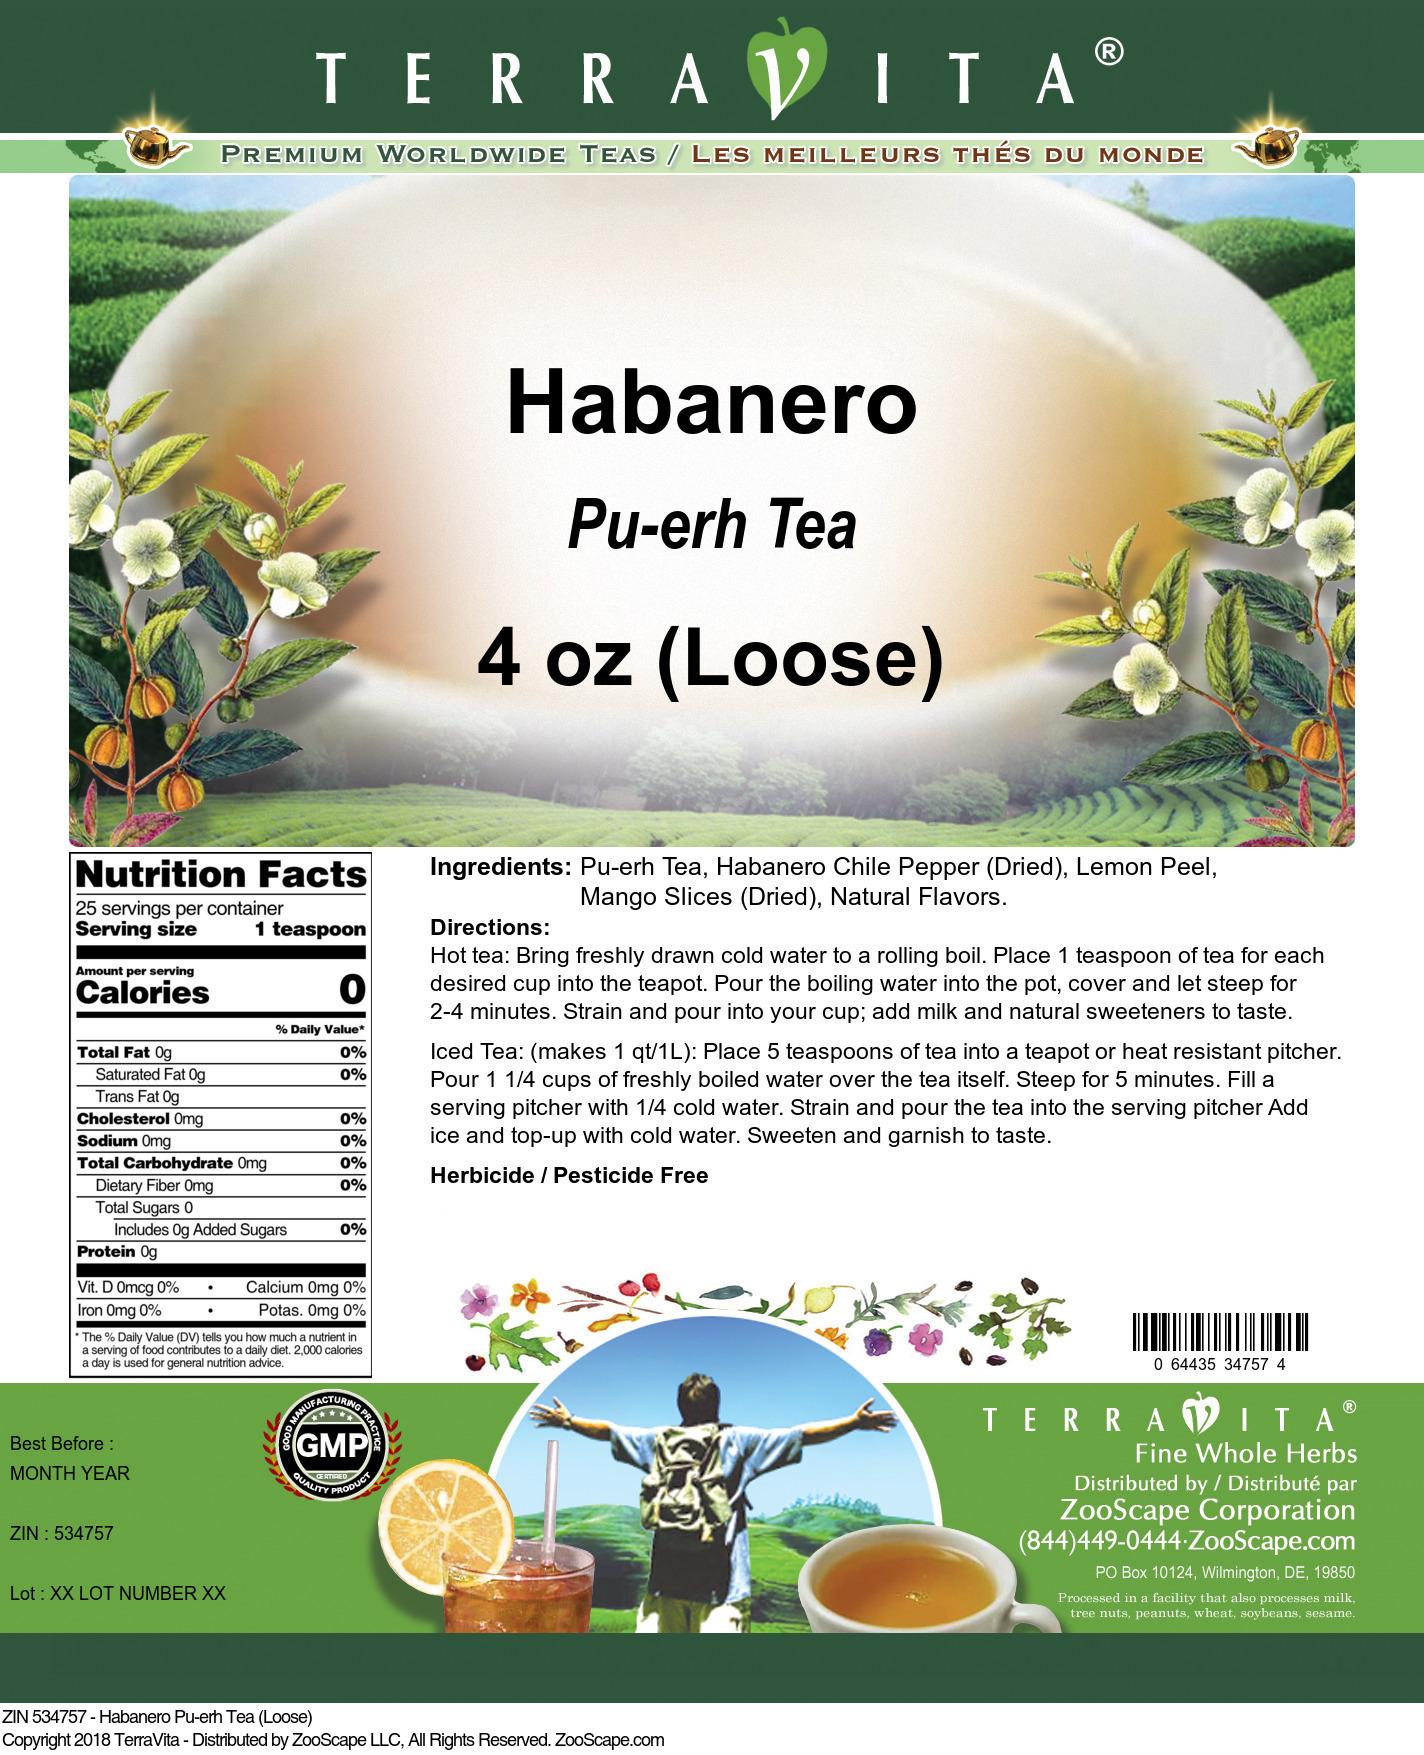 Habanero Pu-erh Tea (Loose)